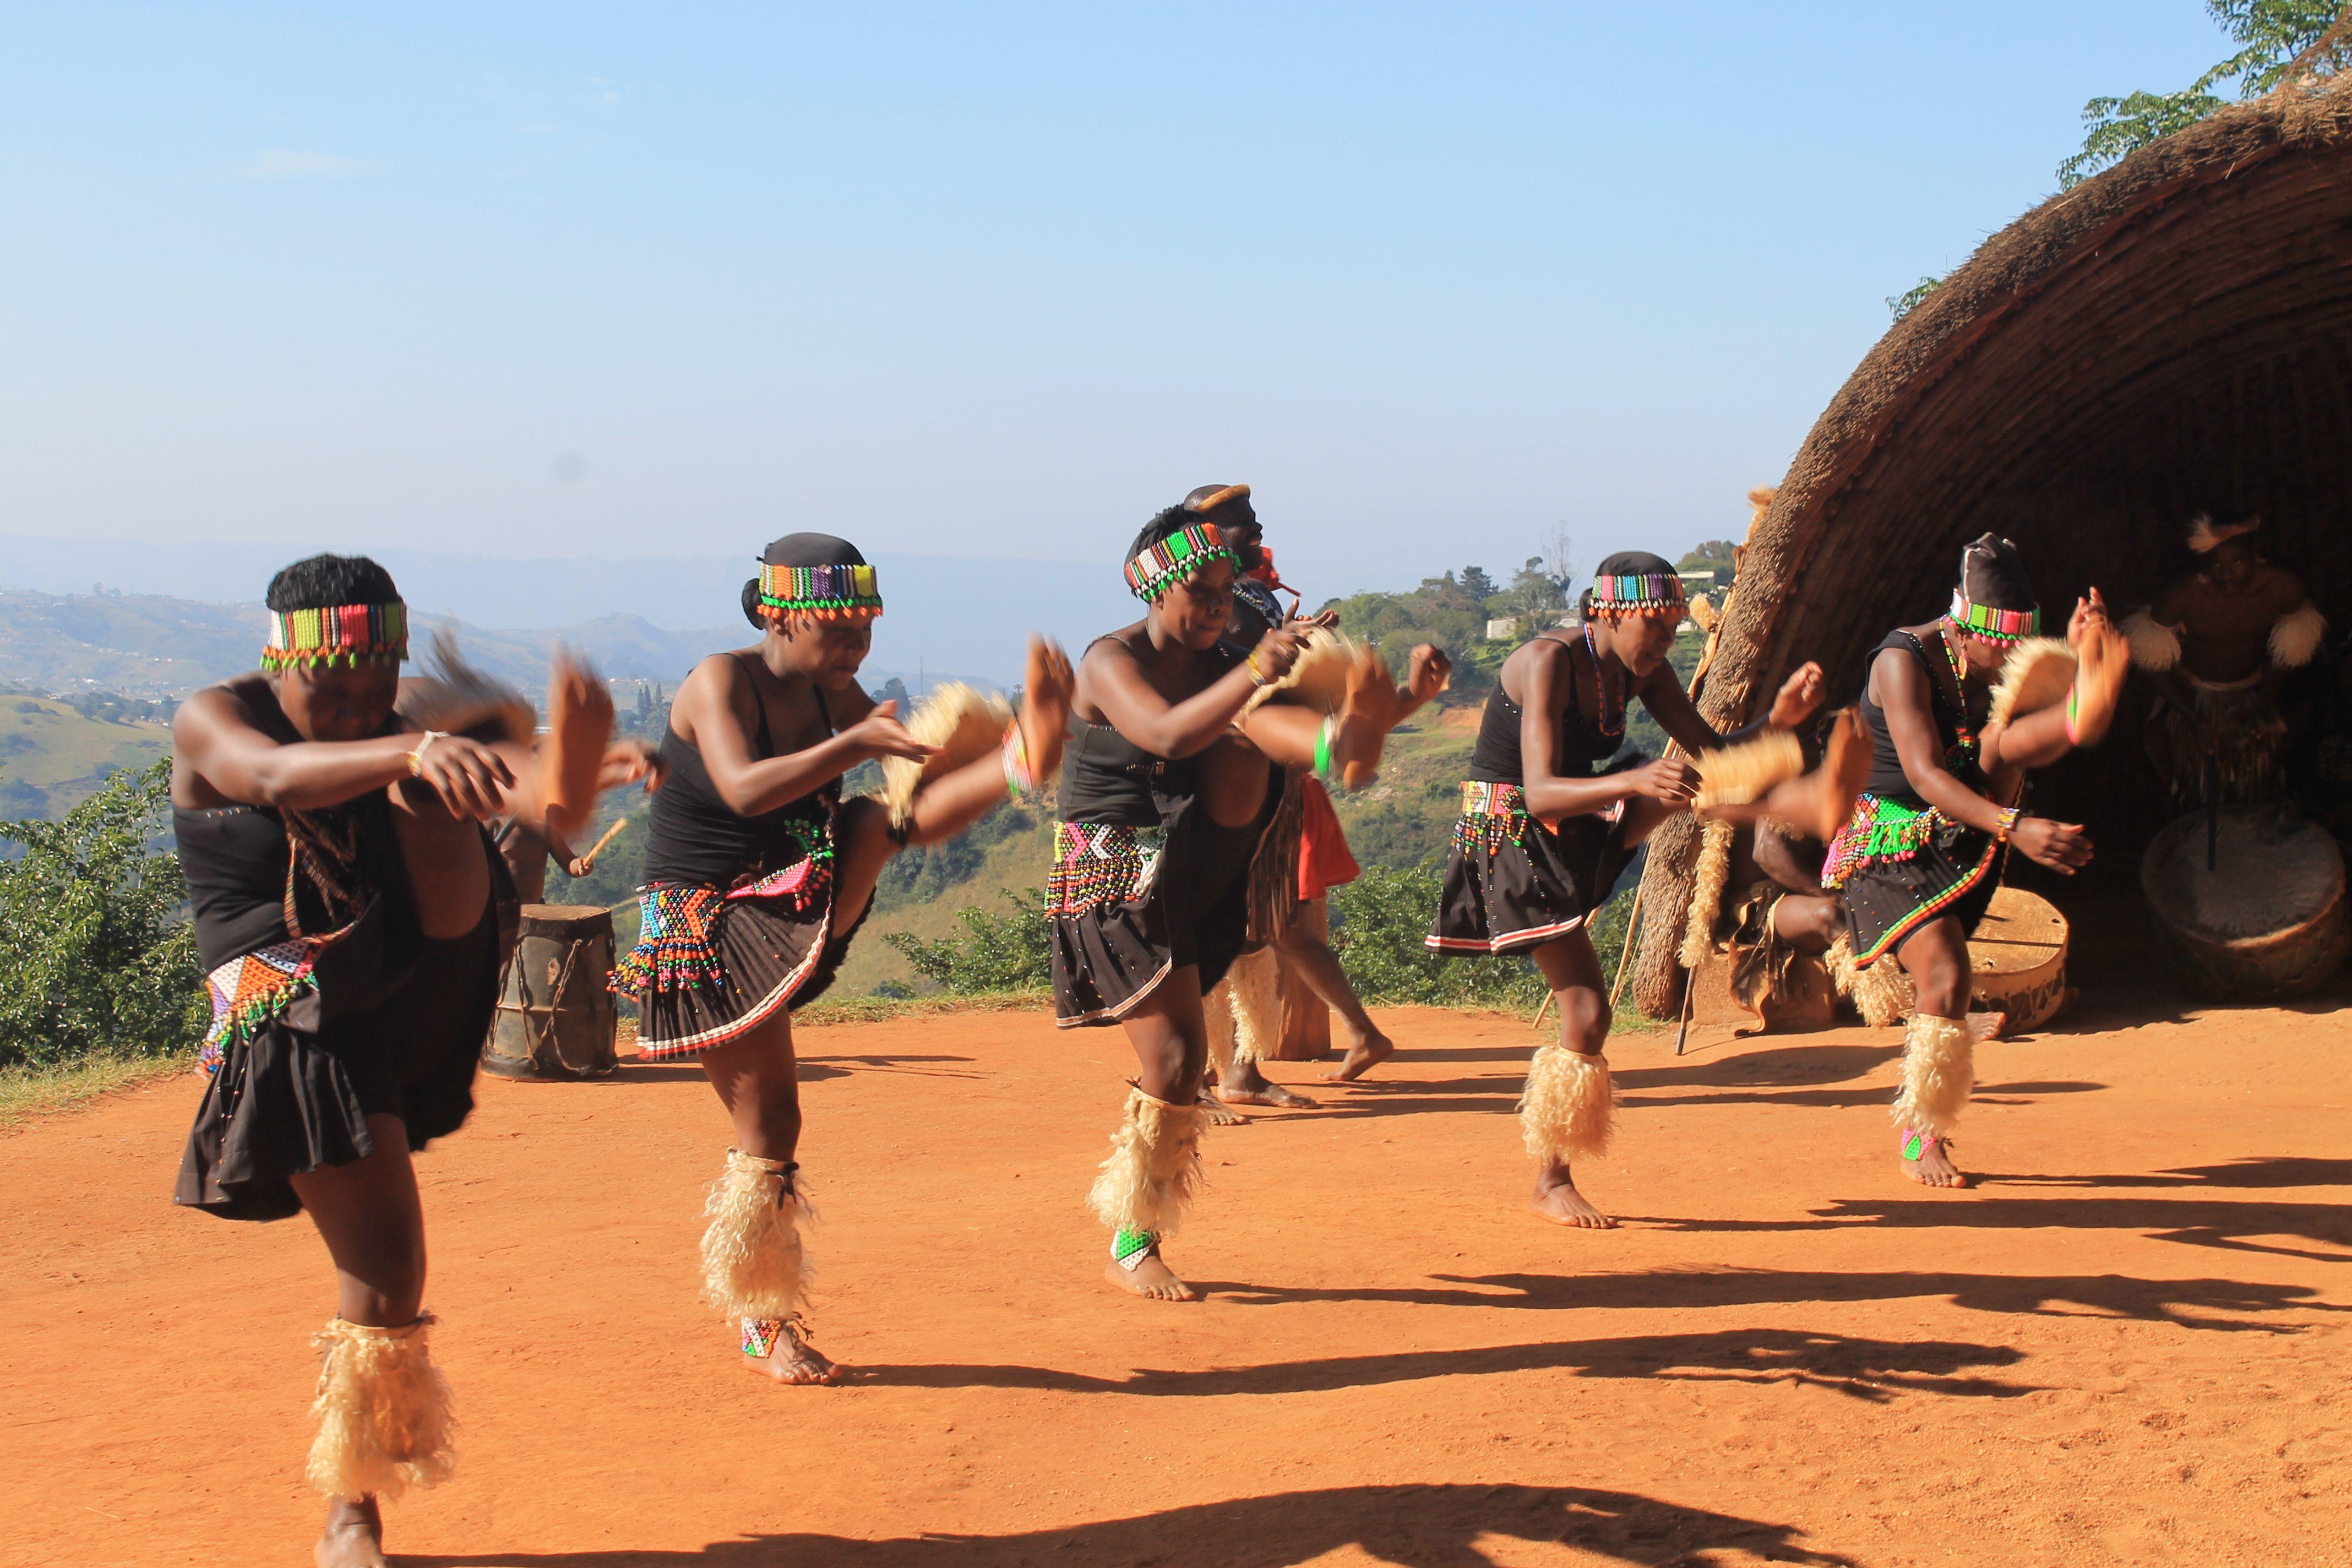 traditional Zulu dancing | Zulu dance, Performance art, Dance